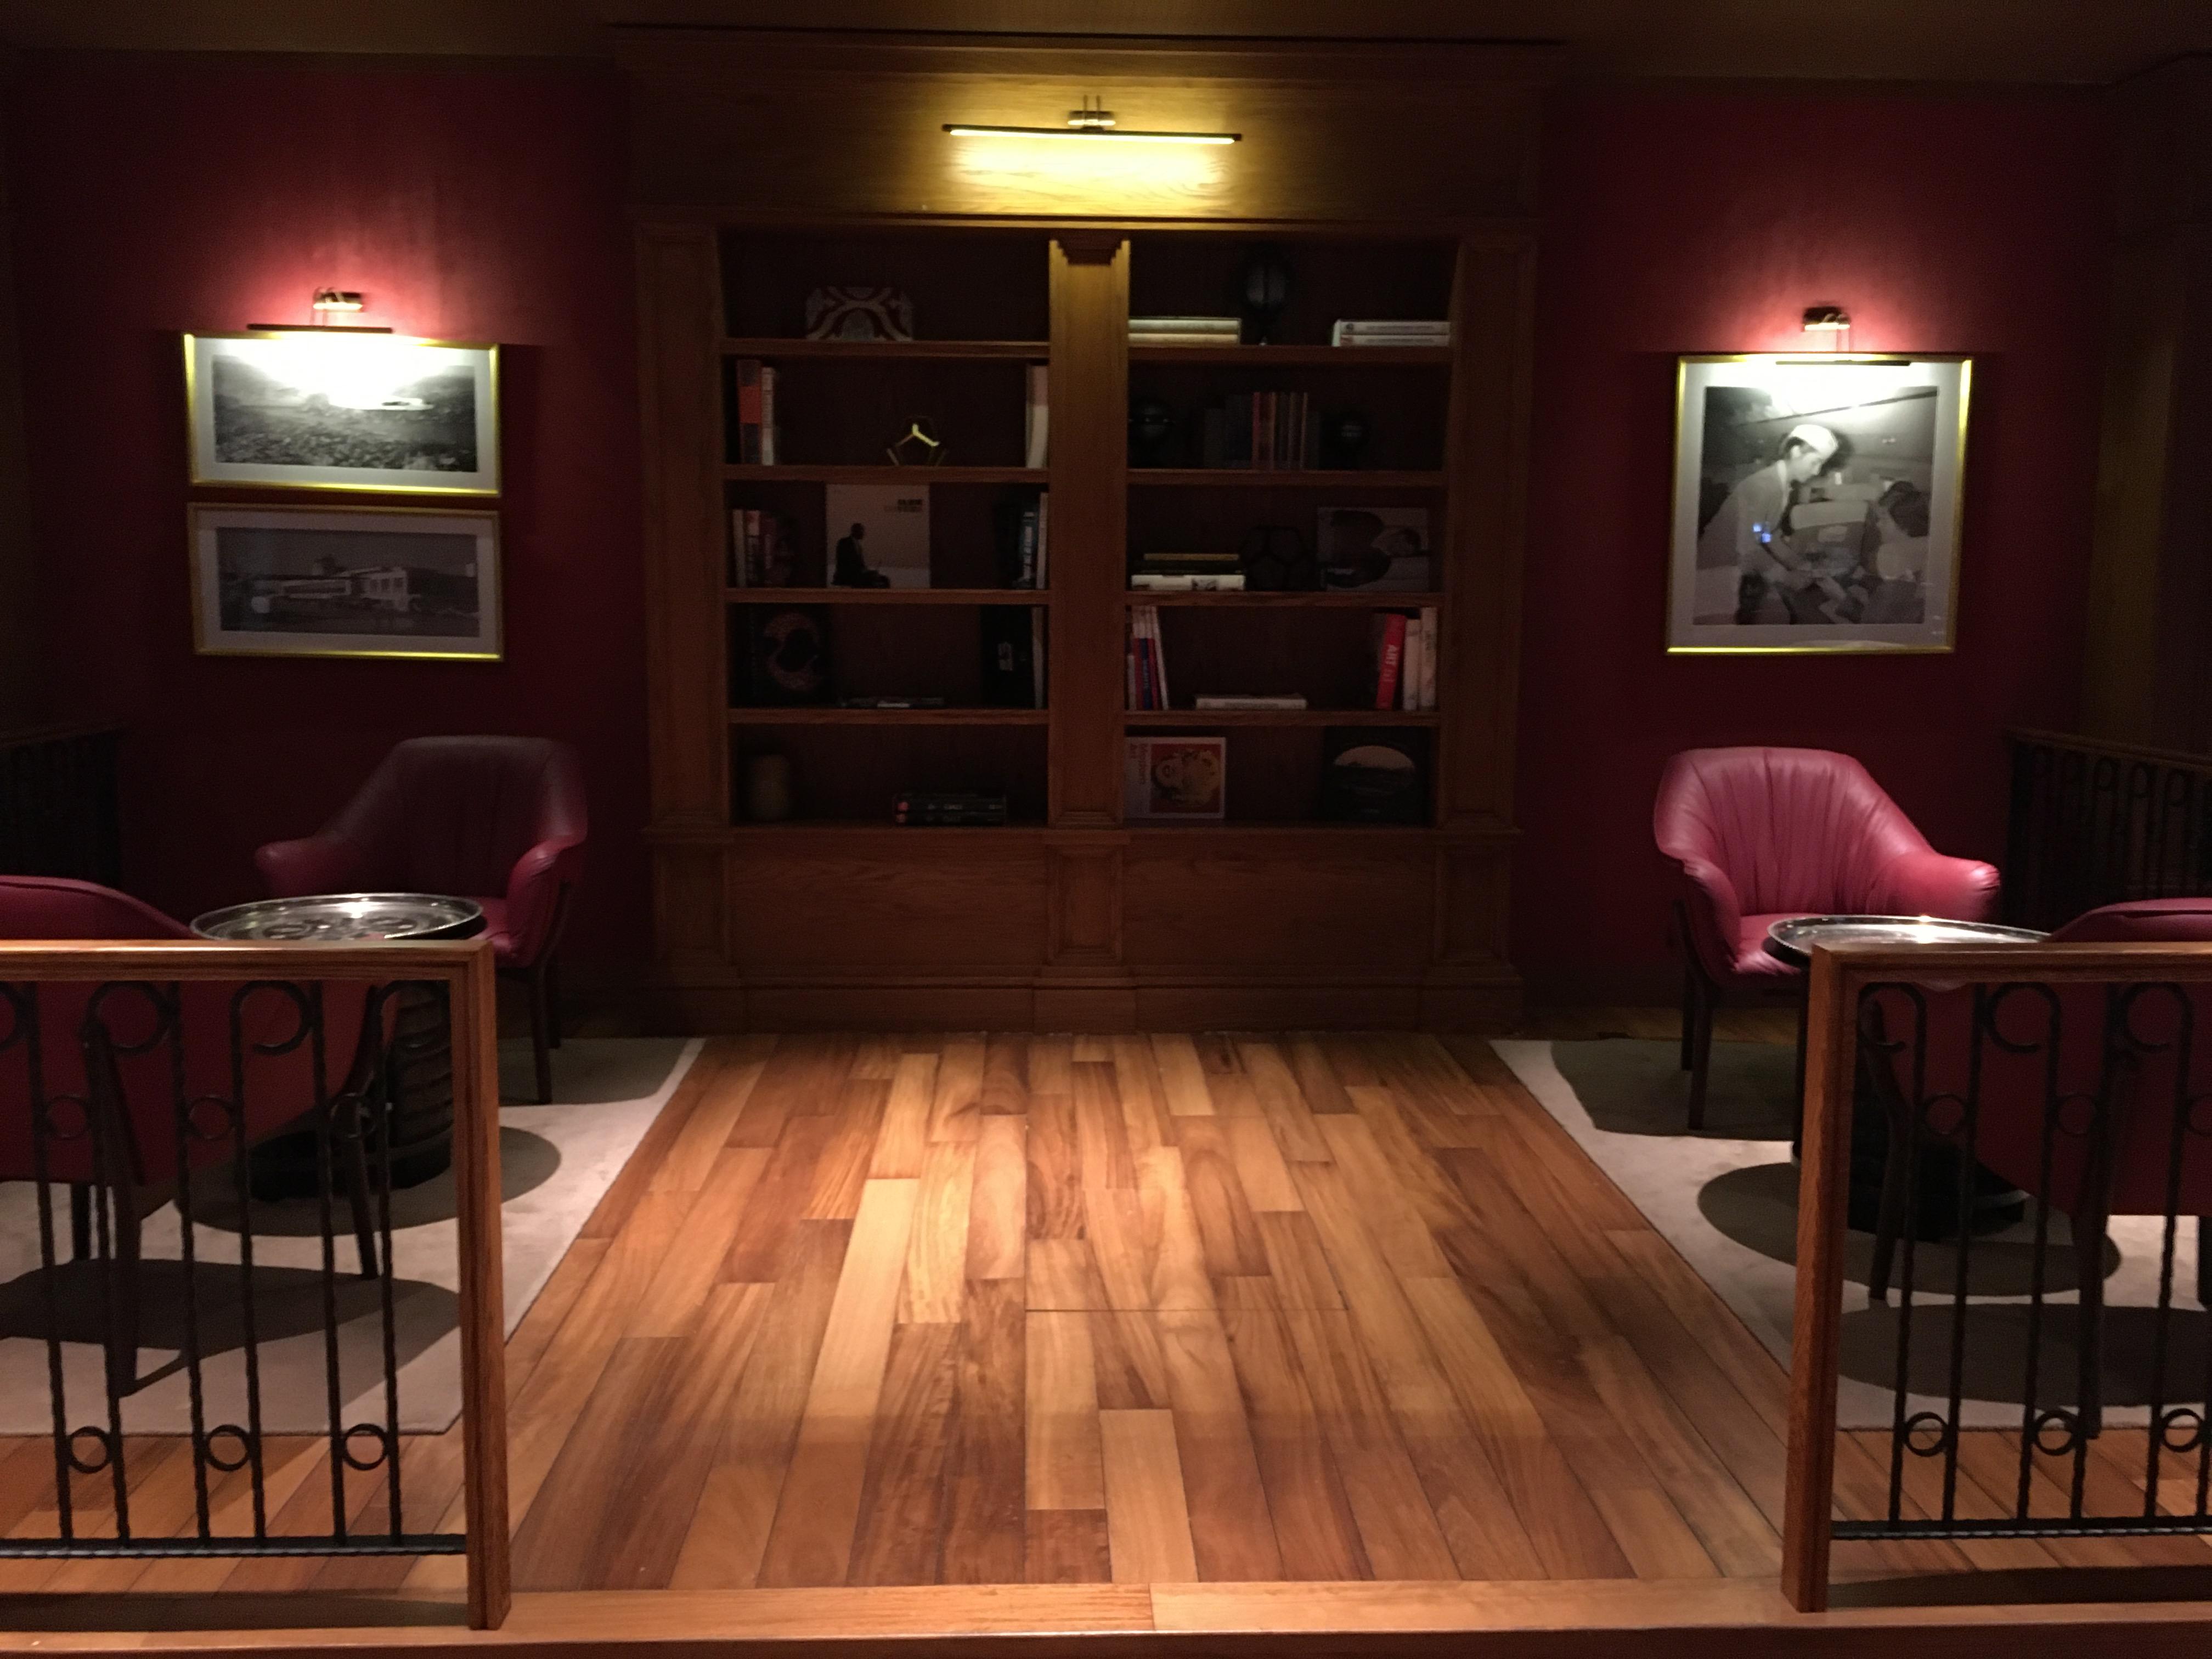 Lounge Review : イスタンブール空港(IST) ターキッシュエアラインズ(TK) Miles & Smiles Lounge